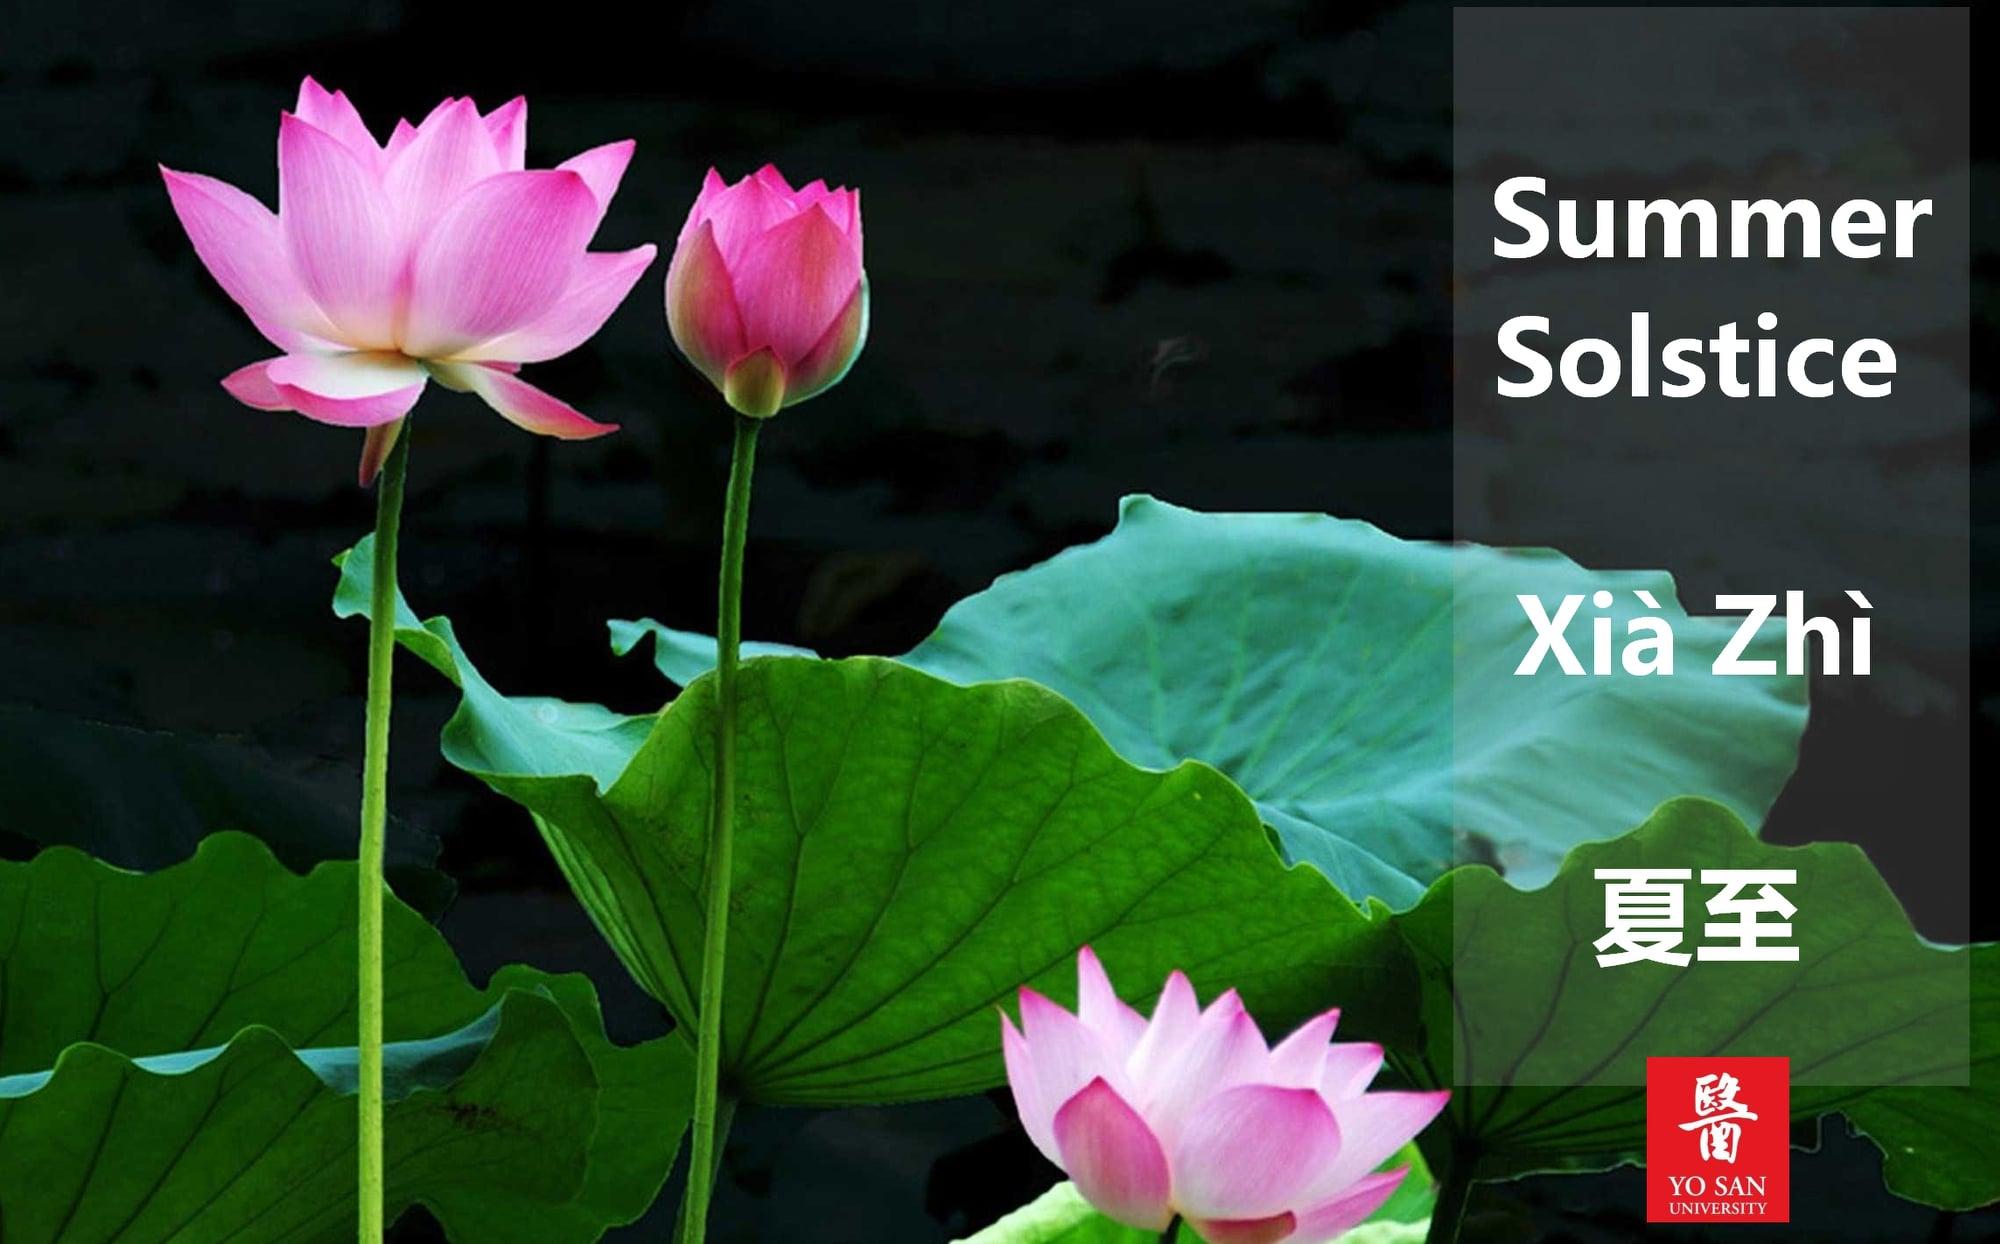 Summer Solstice Xià Zhì 夏至